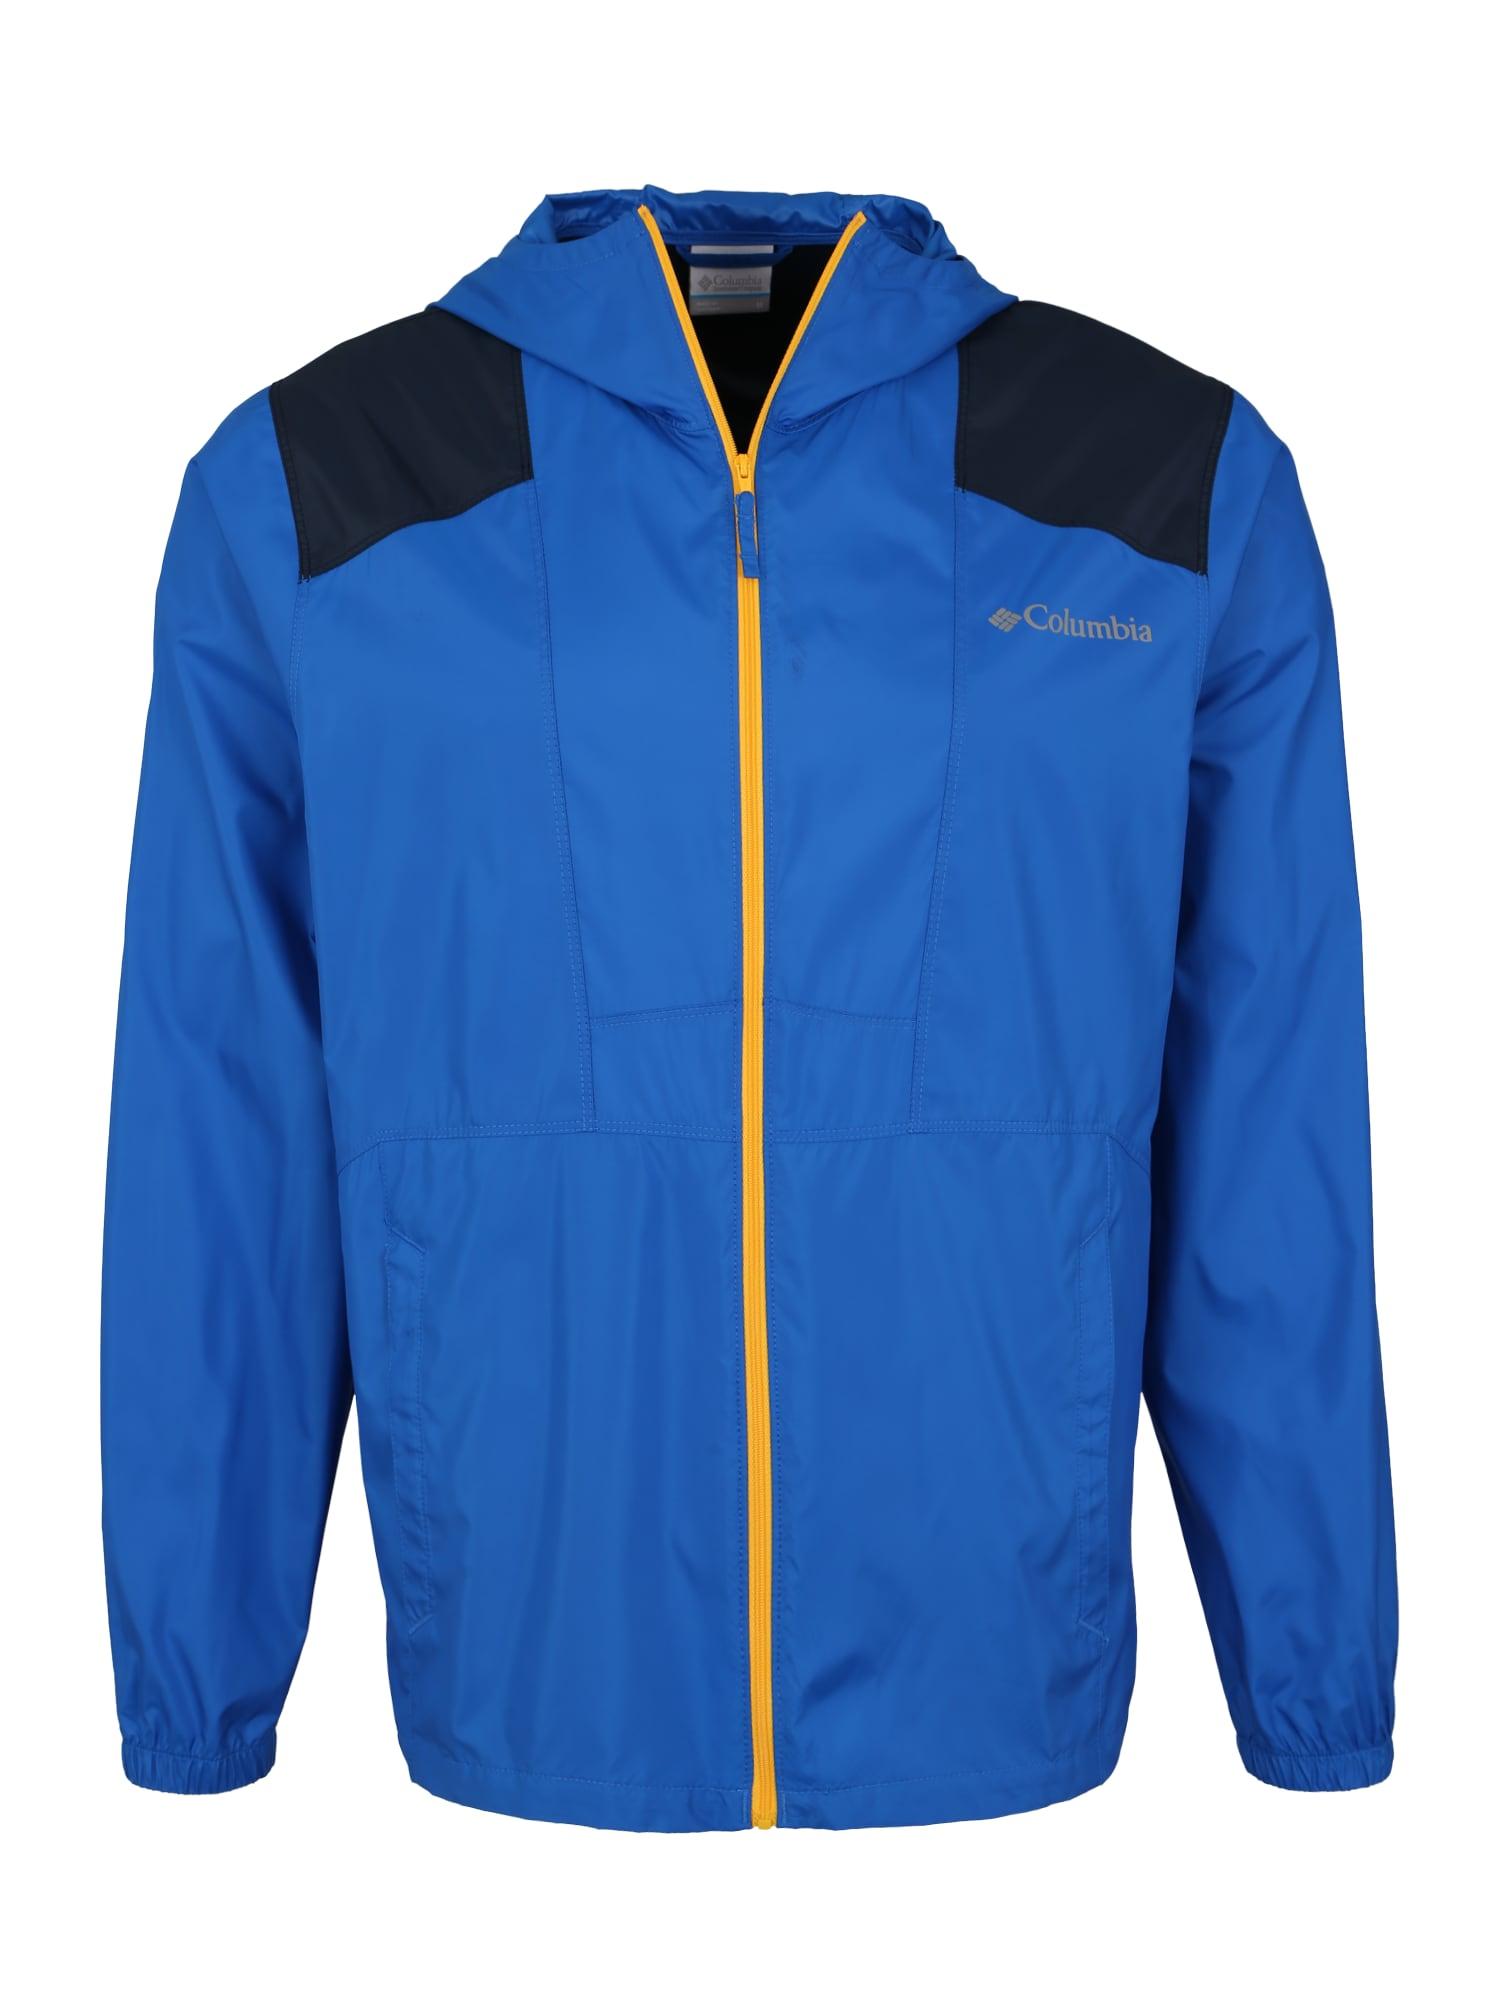 Outdoorová bunda Flashback modrá černá COLUMBIA